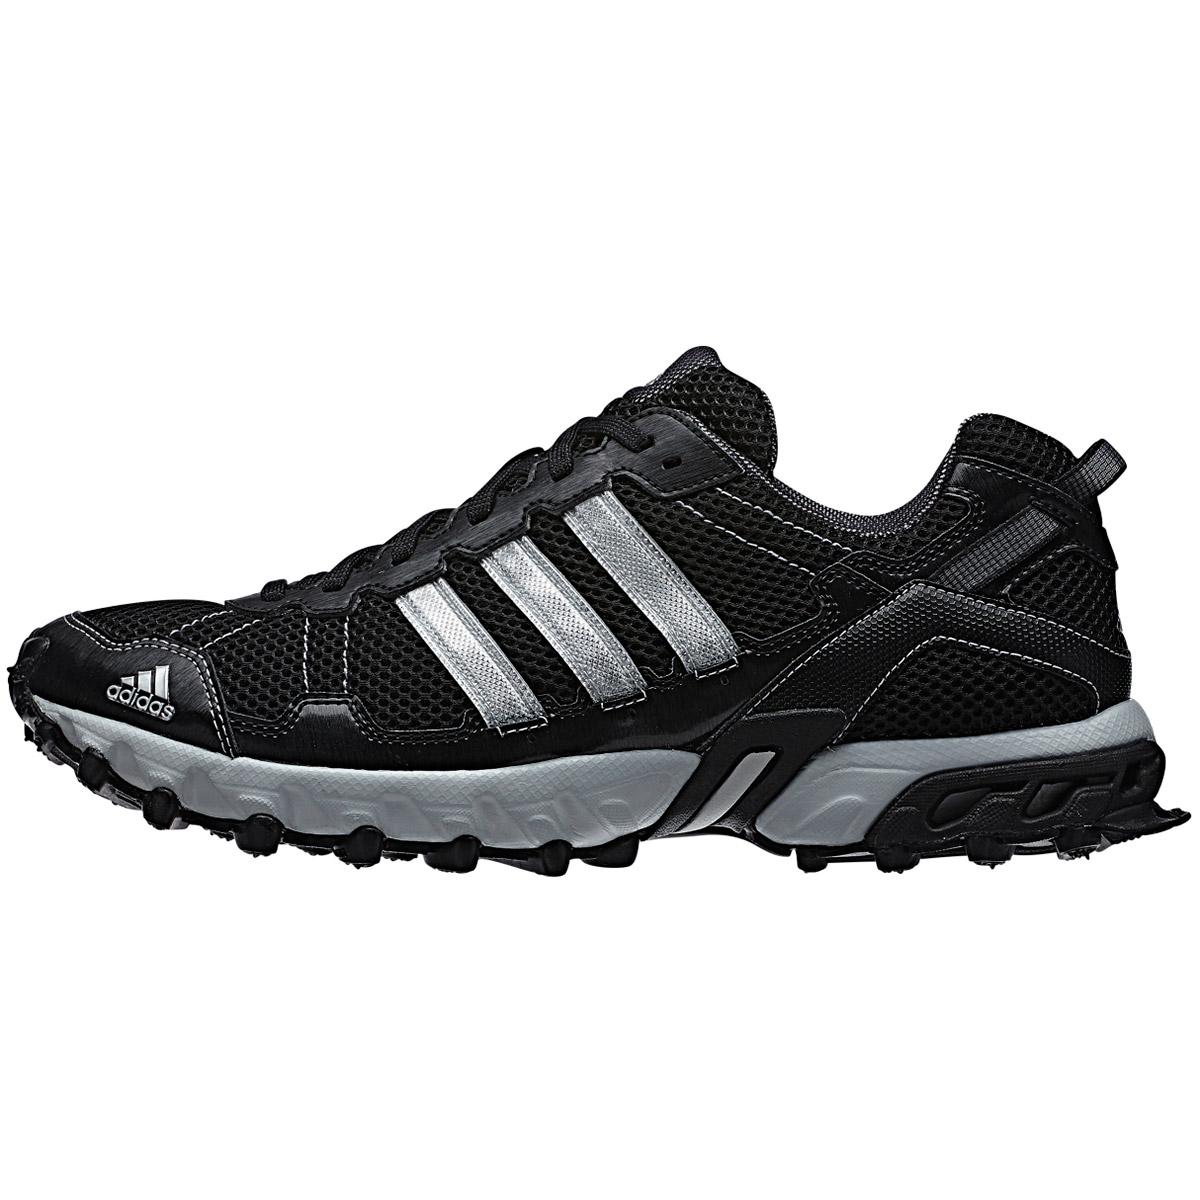 Thrasher 1.1 M Trail Running Shoe